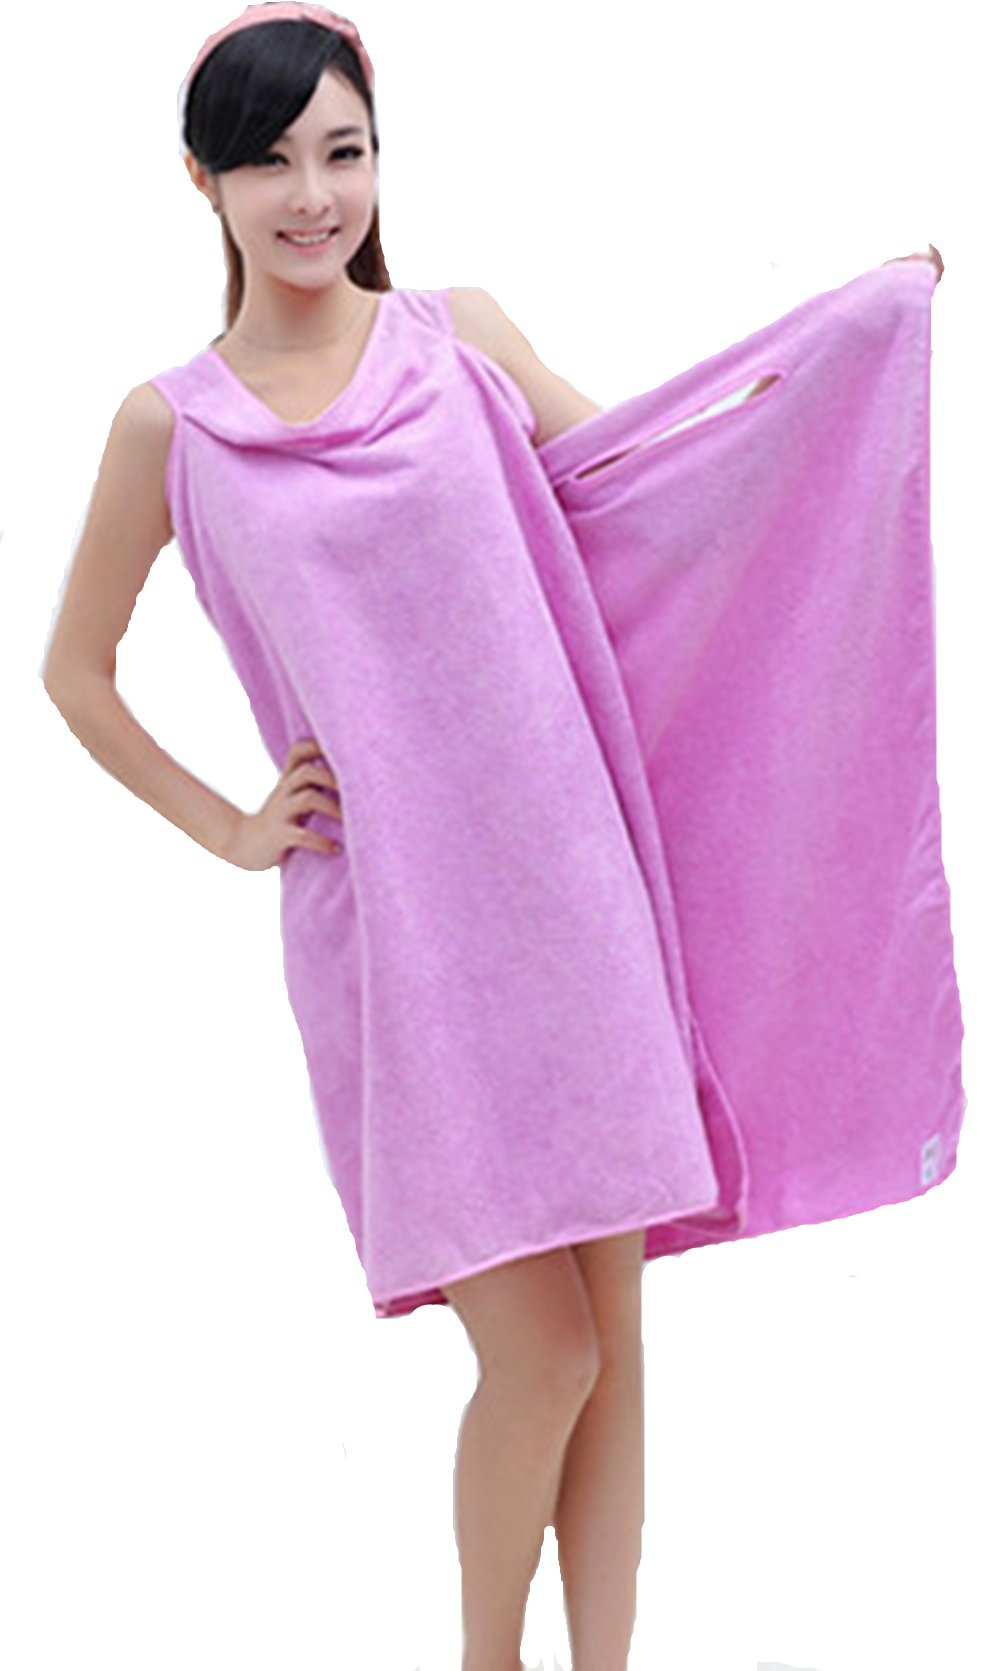 Magic Multi Sexy Women Lady Travel Body Wrap Absorbent Microfiber Shower Bath Drying Terry Towel Spa Bikini Cover Up Beach Skirt Dress Bathrobe Robe (Purple)